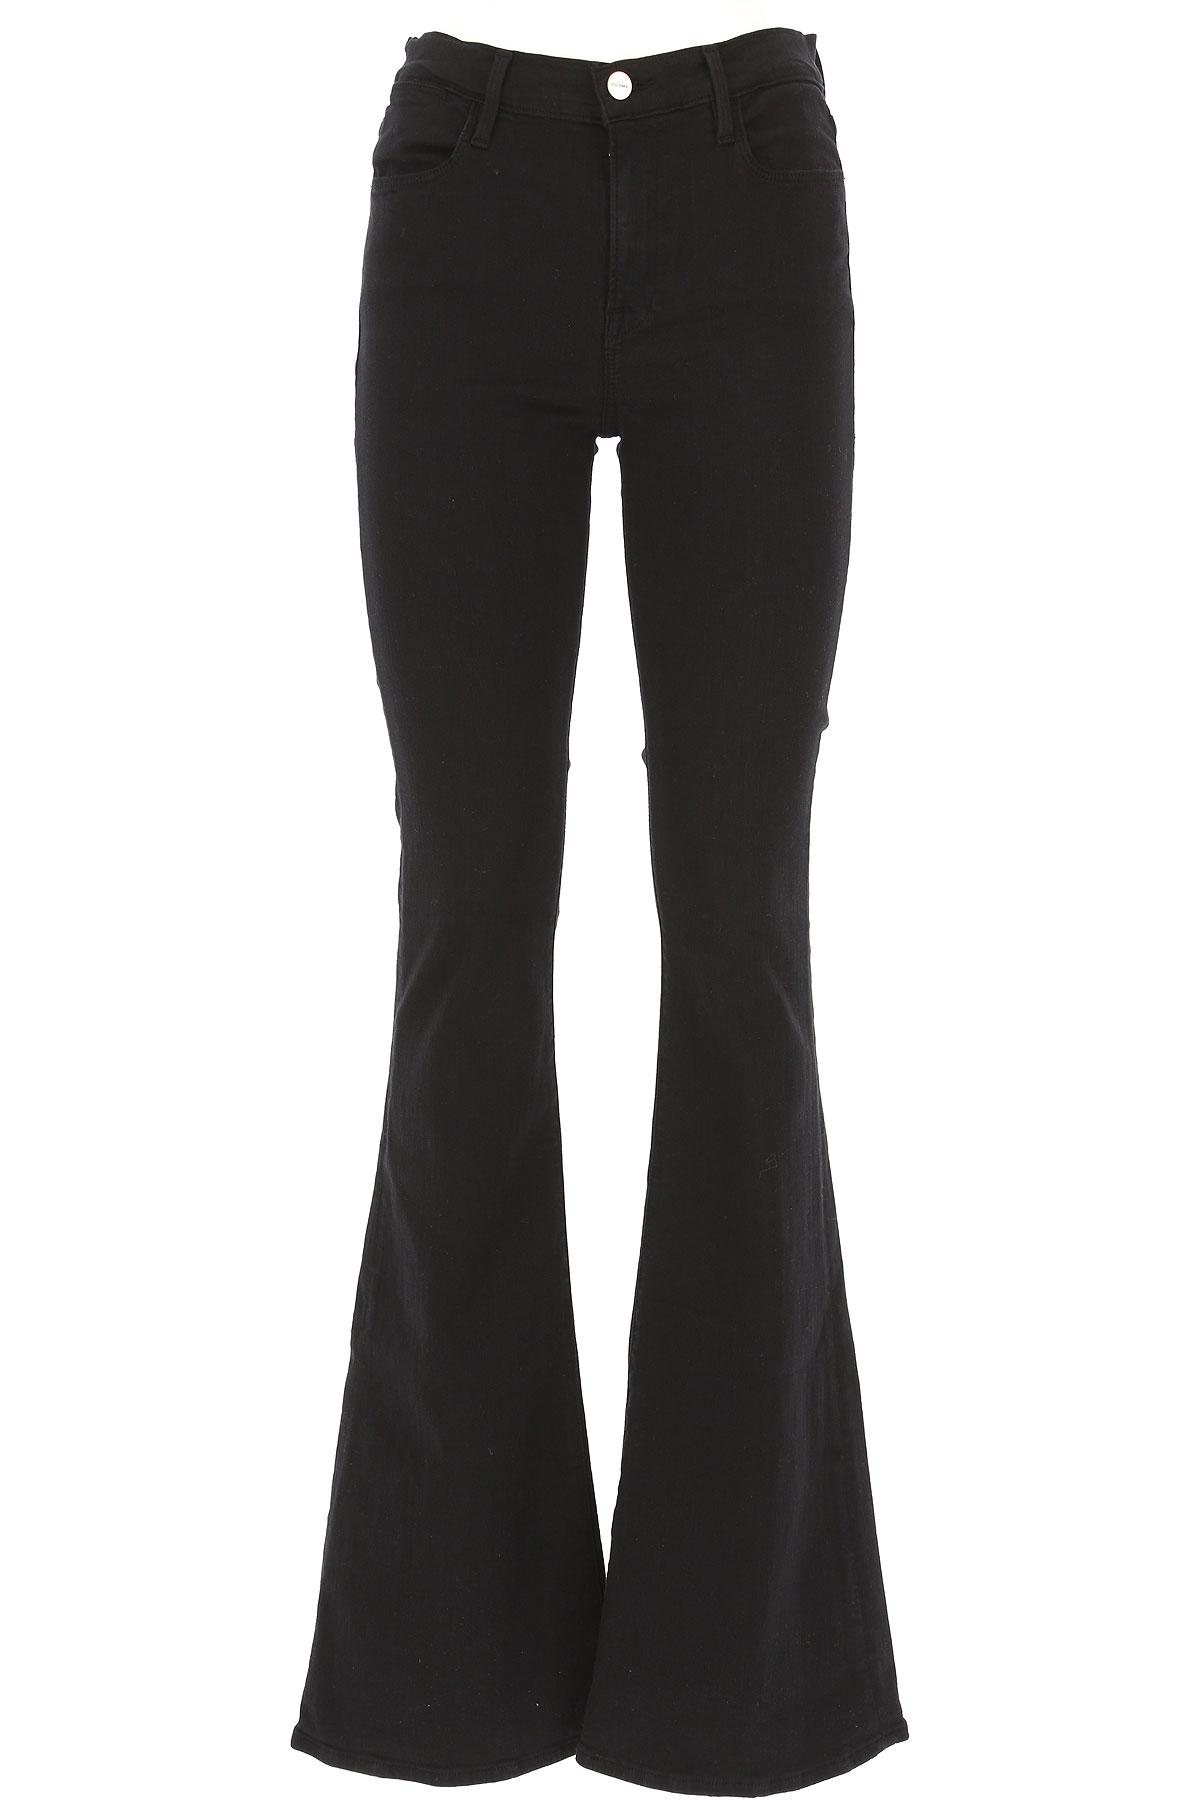 Image of Frame Jeans, Black, Cotton, 2017, 28